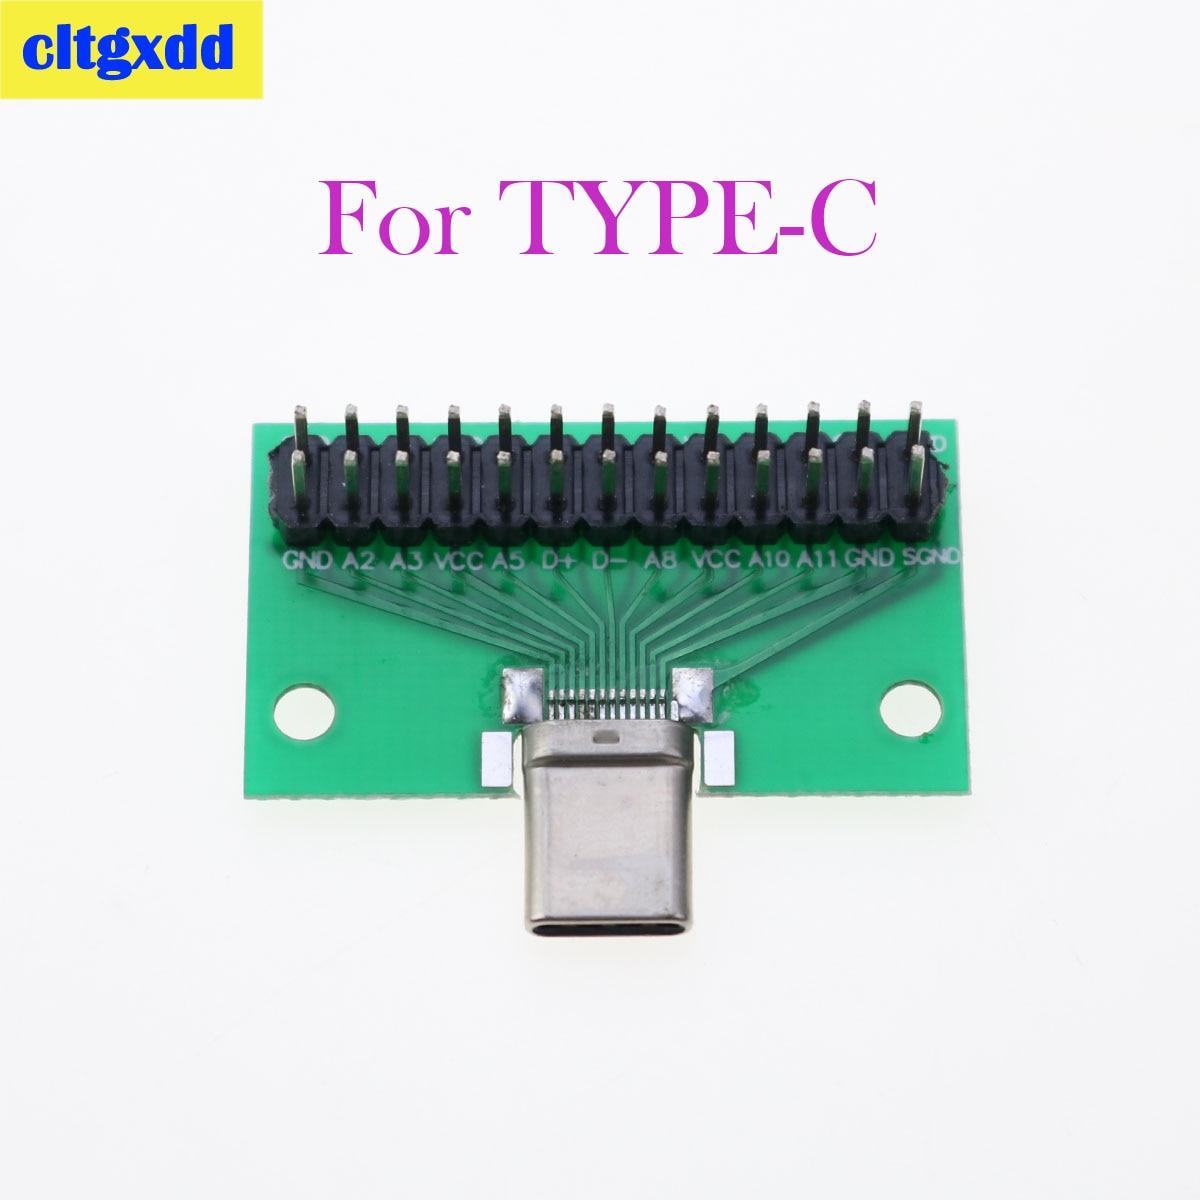 Cltgxdd 1 Uds Tipo-C macho a USB 3,1 prueba adaptador de placa...